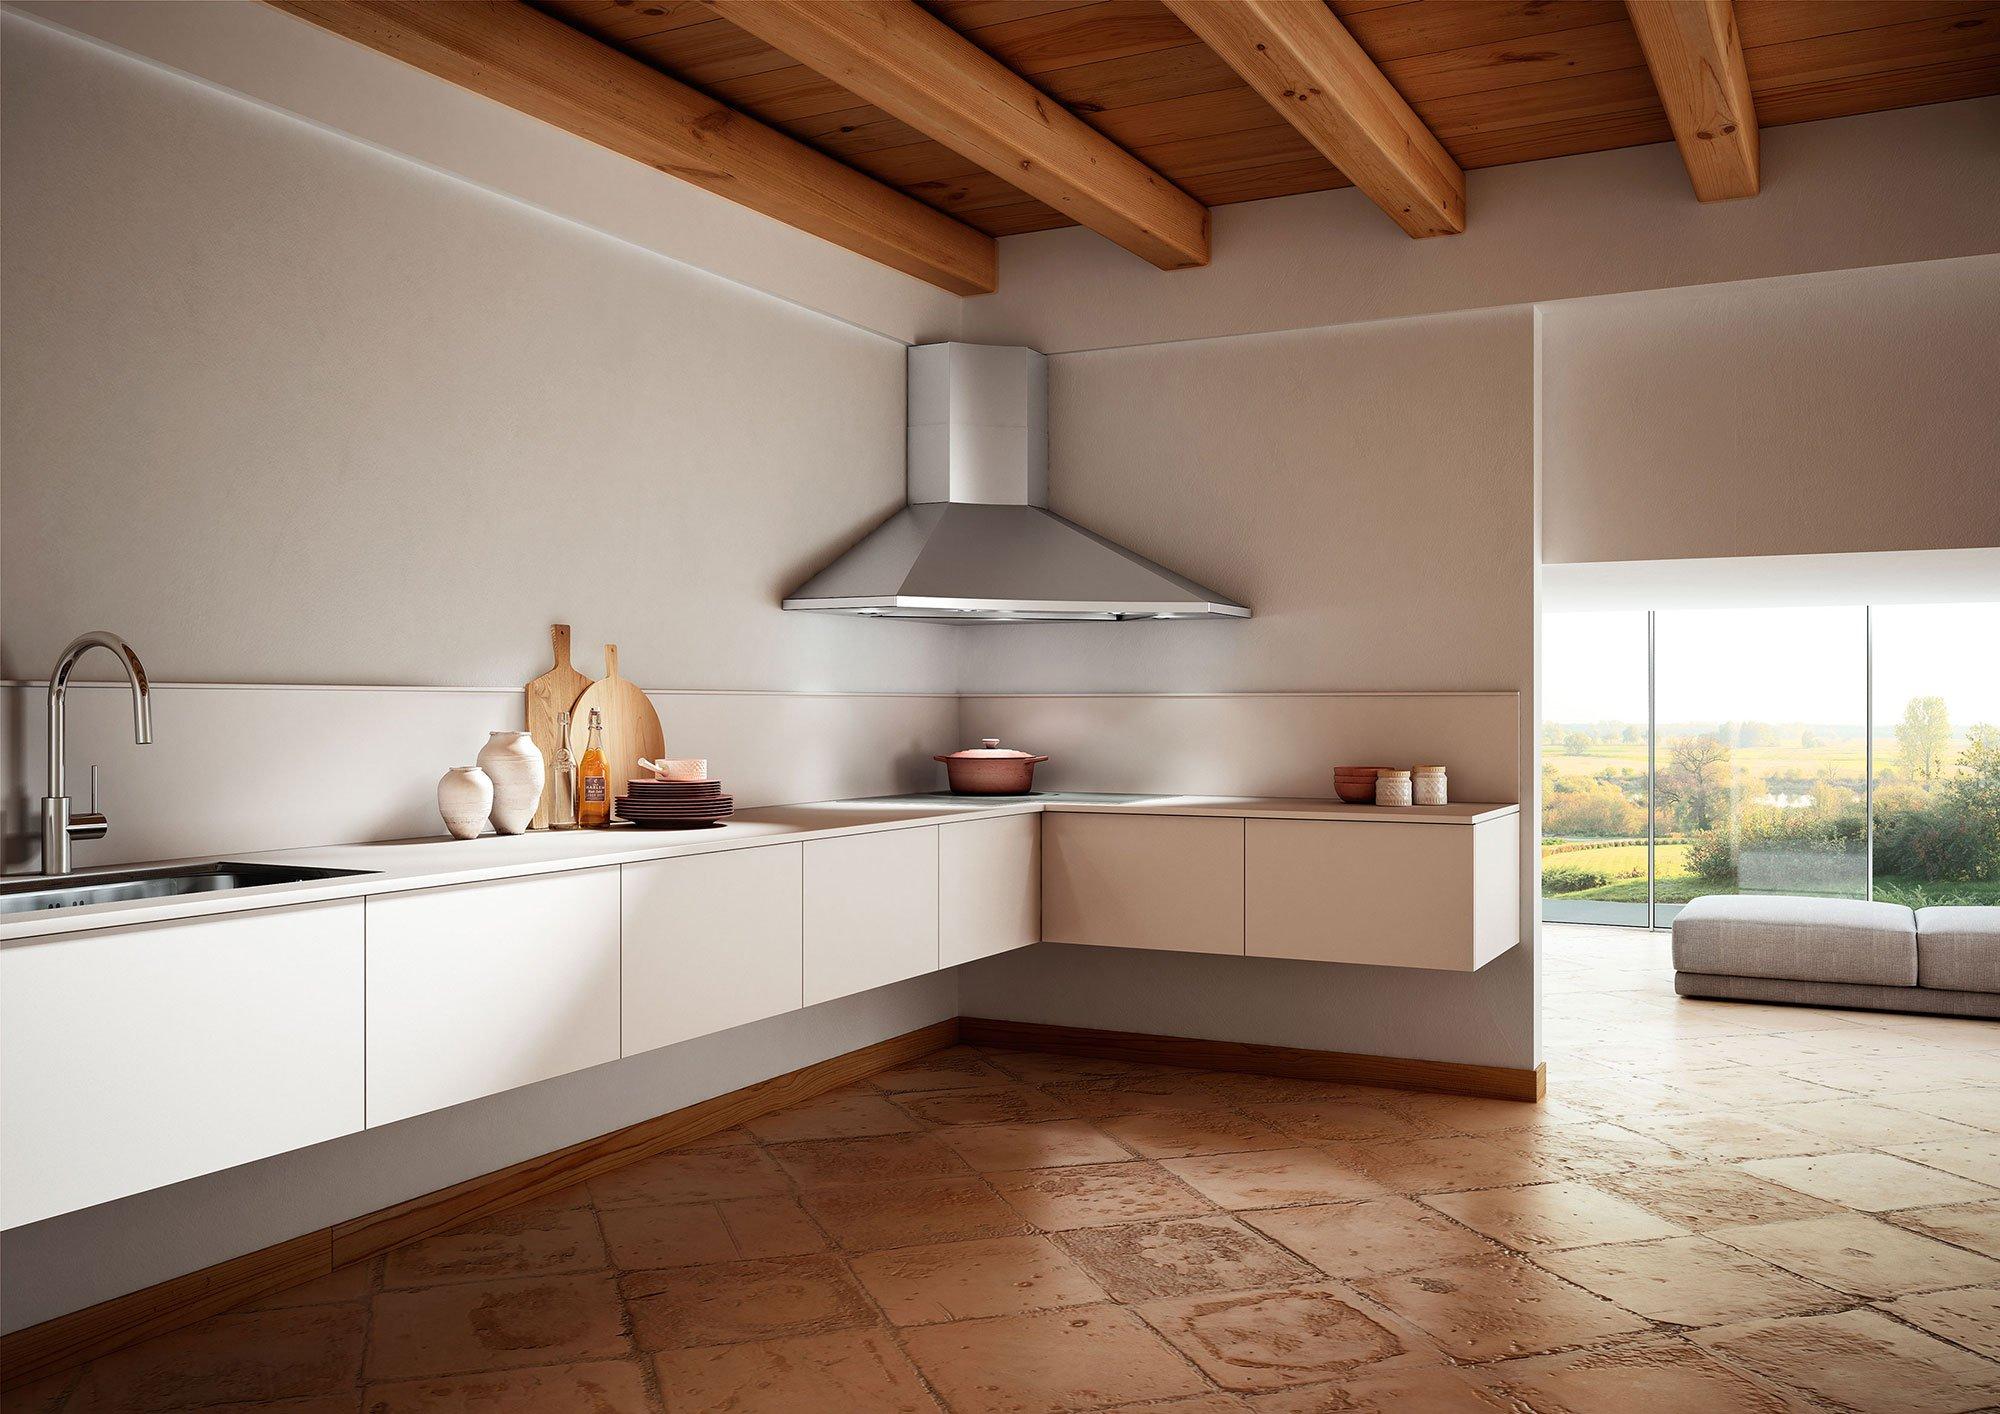 Copricaldaia da esterno leroy merlin - Ikea pensili cucina scolapiatti ...